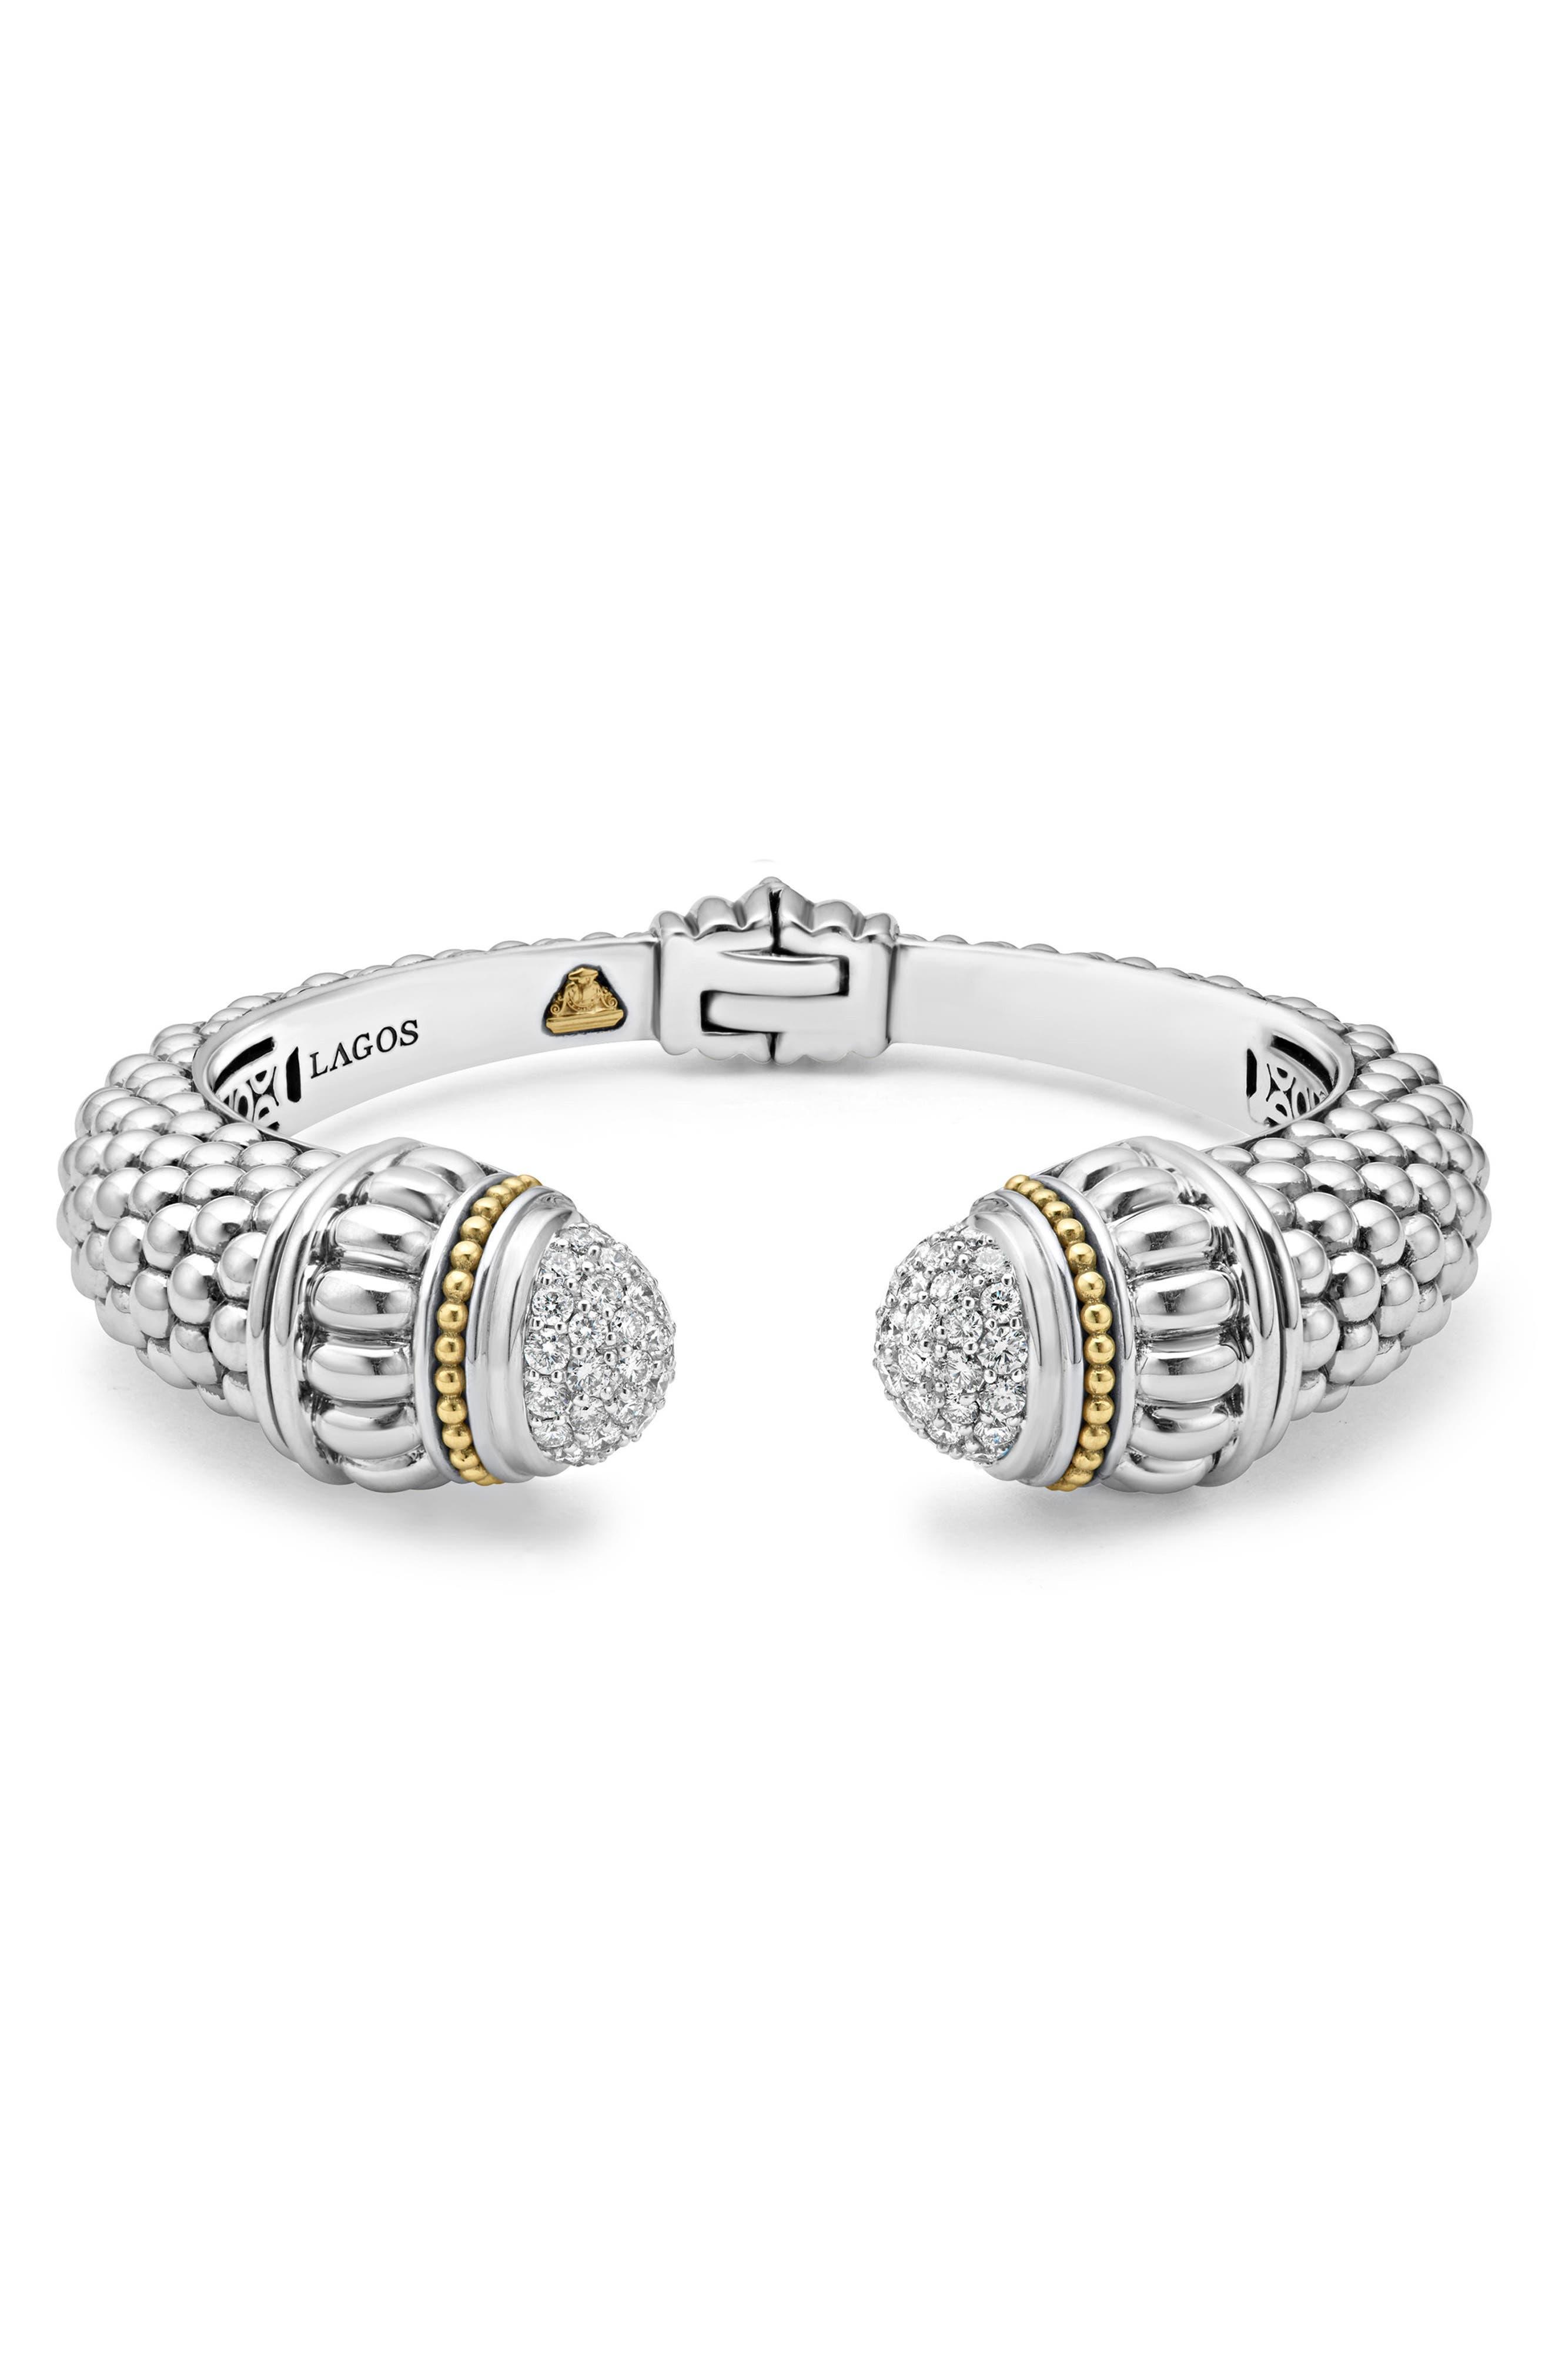 Caviar Diamond Hinge Cuff,                             Main thumbnail 1, color,                             SILVER